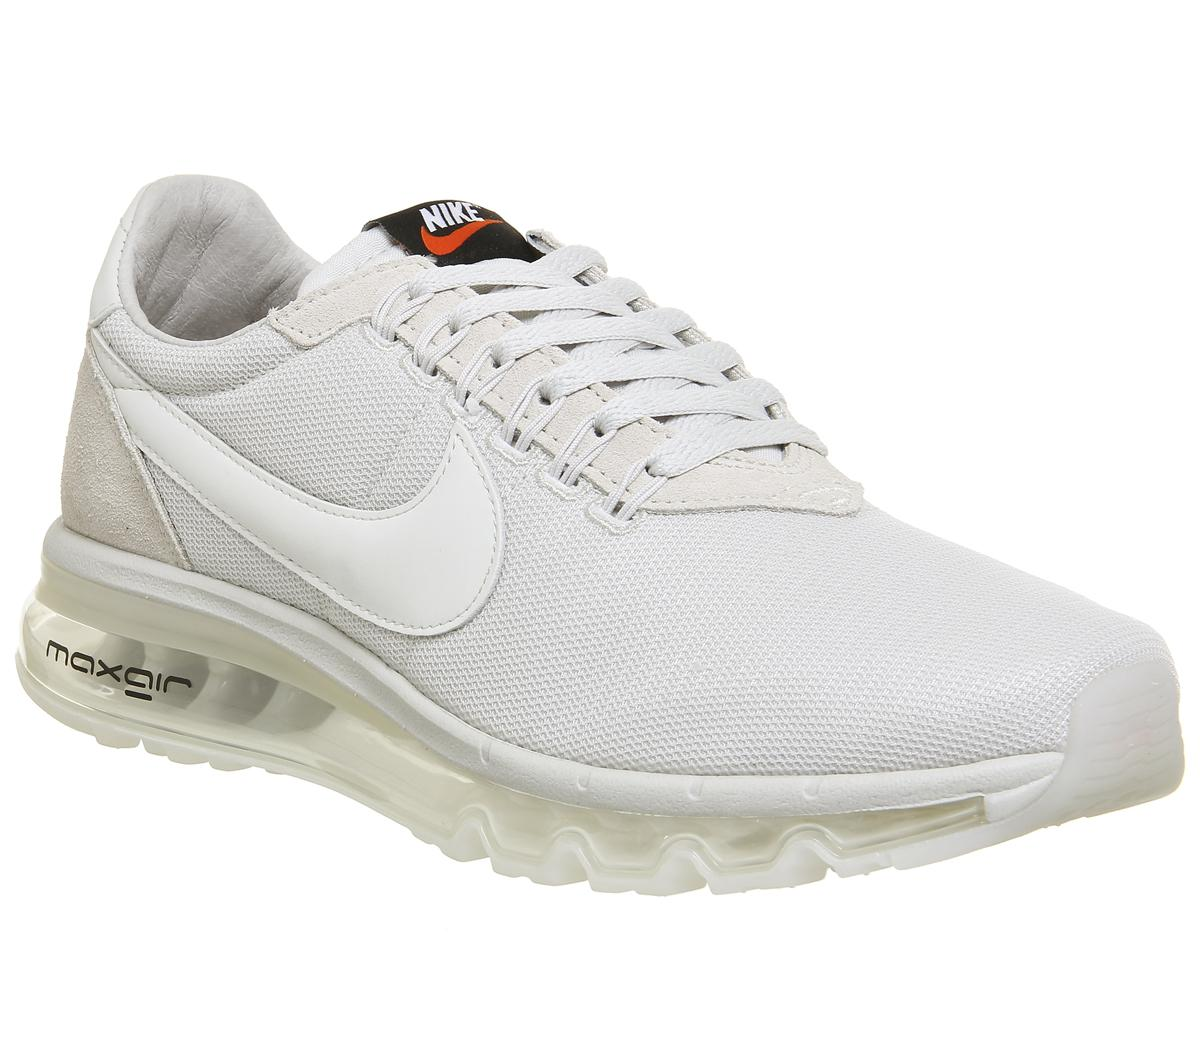 nett Nike Air Max LD Zero Damen und Herren Air Max